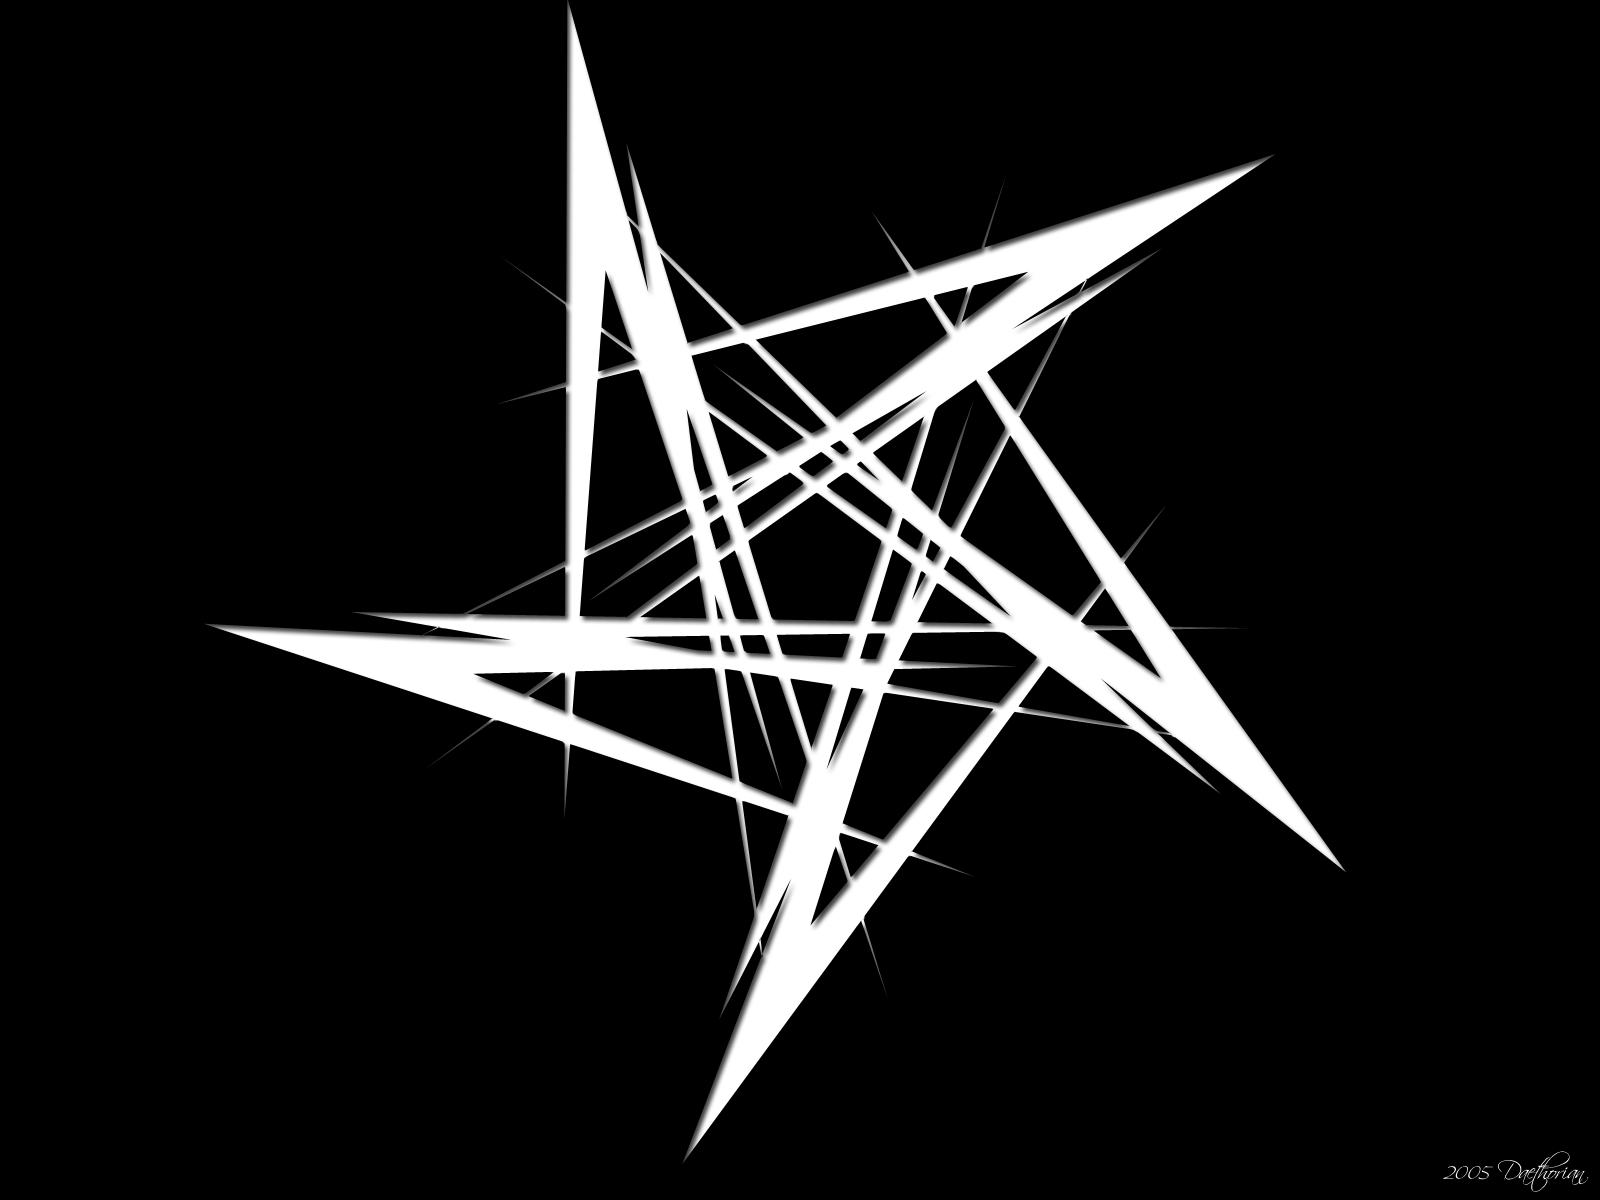 Hd Pentagram Wallpapers